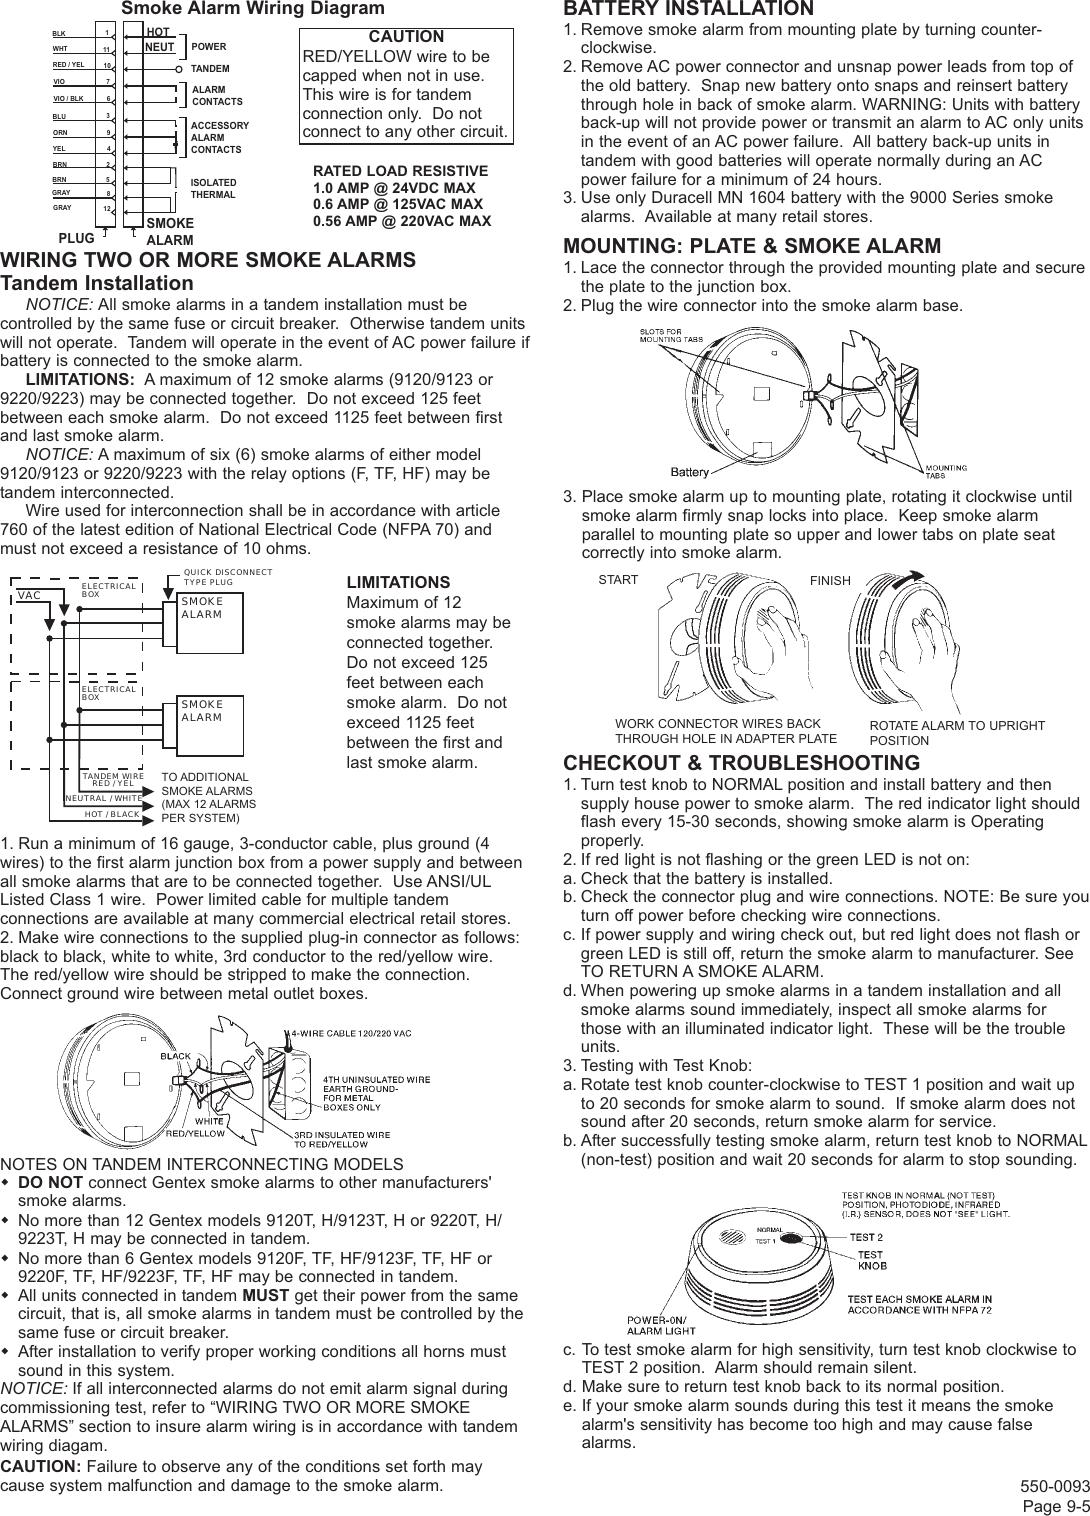 Gentex Fire Alarm Wiring Diagram